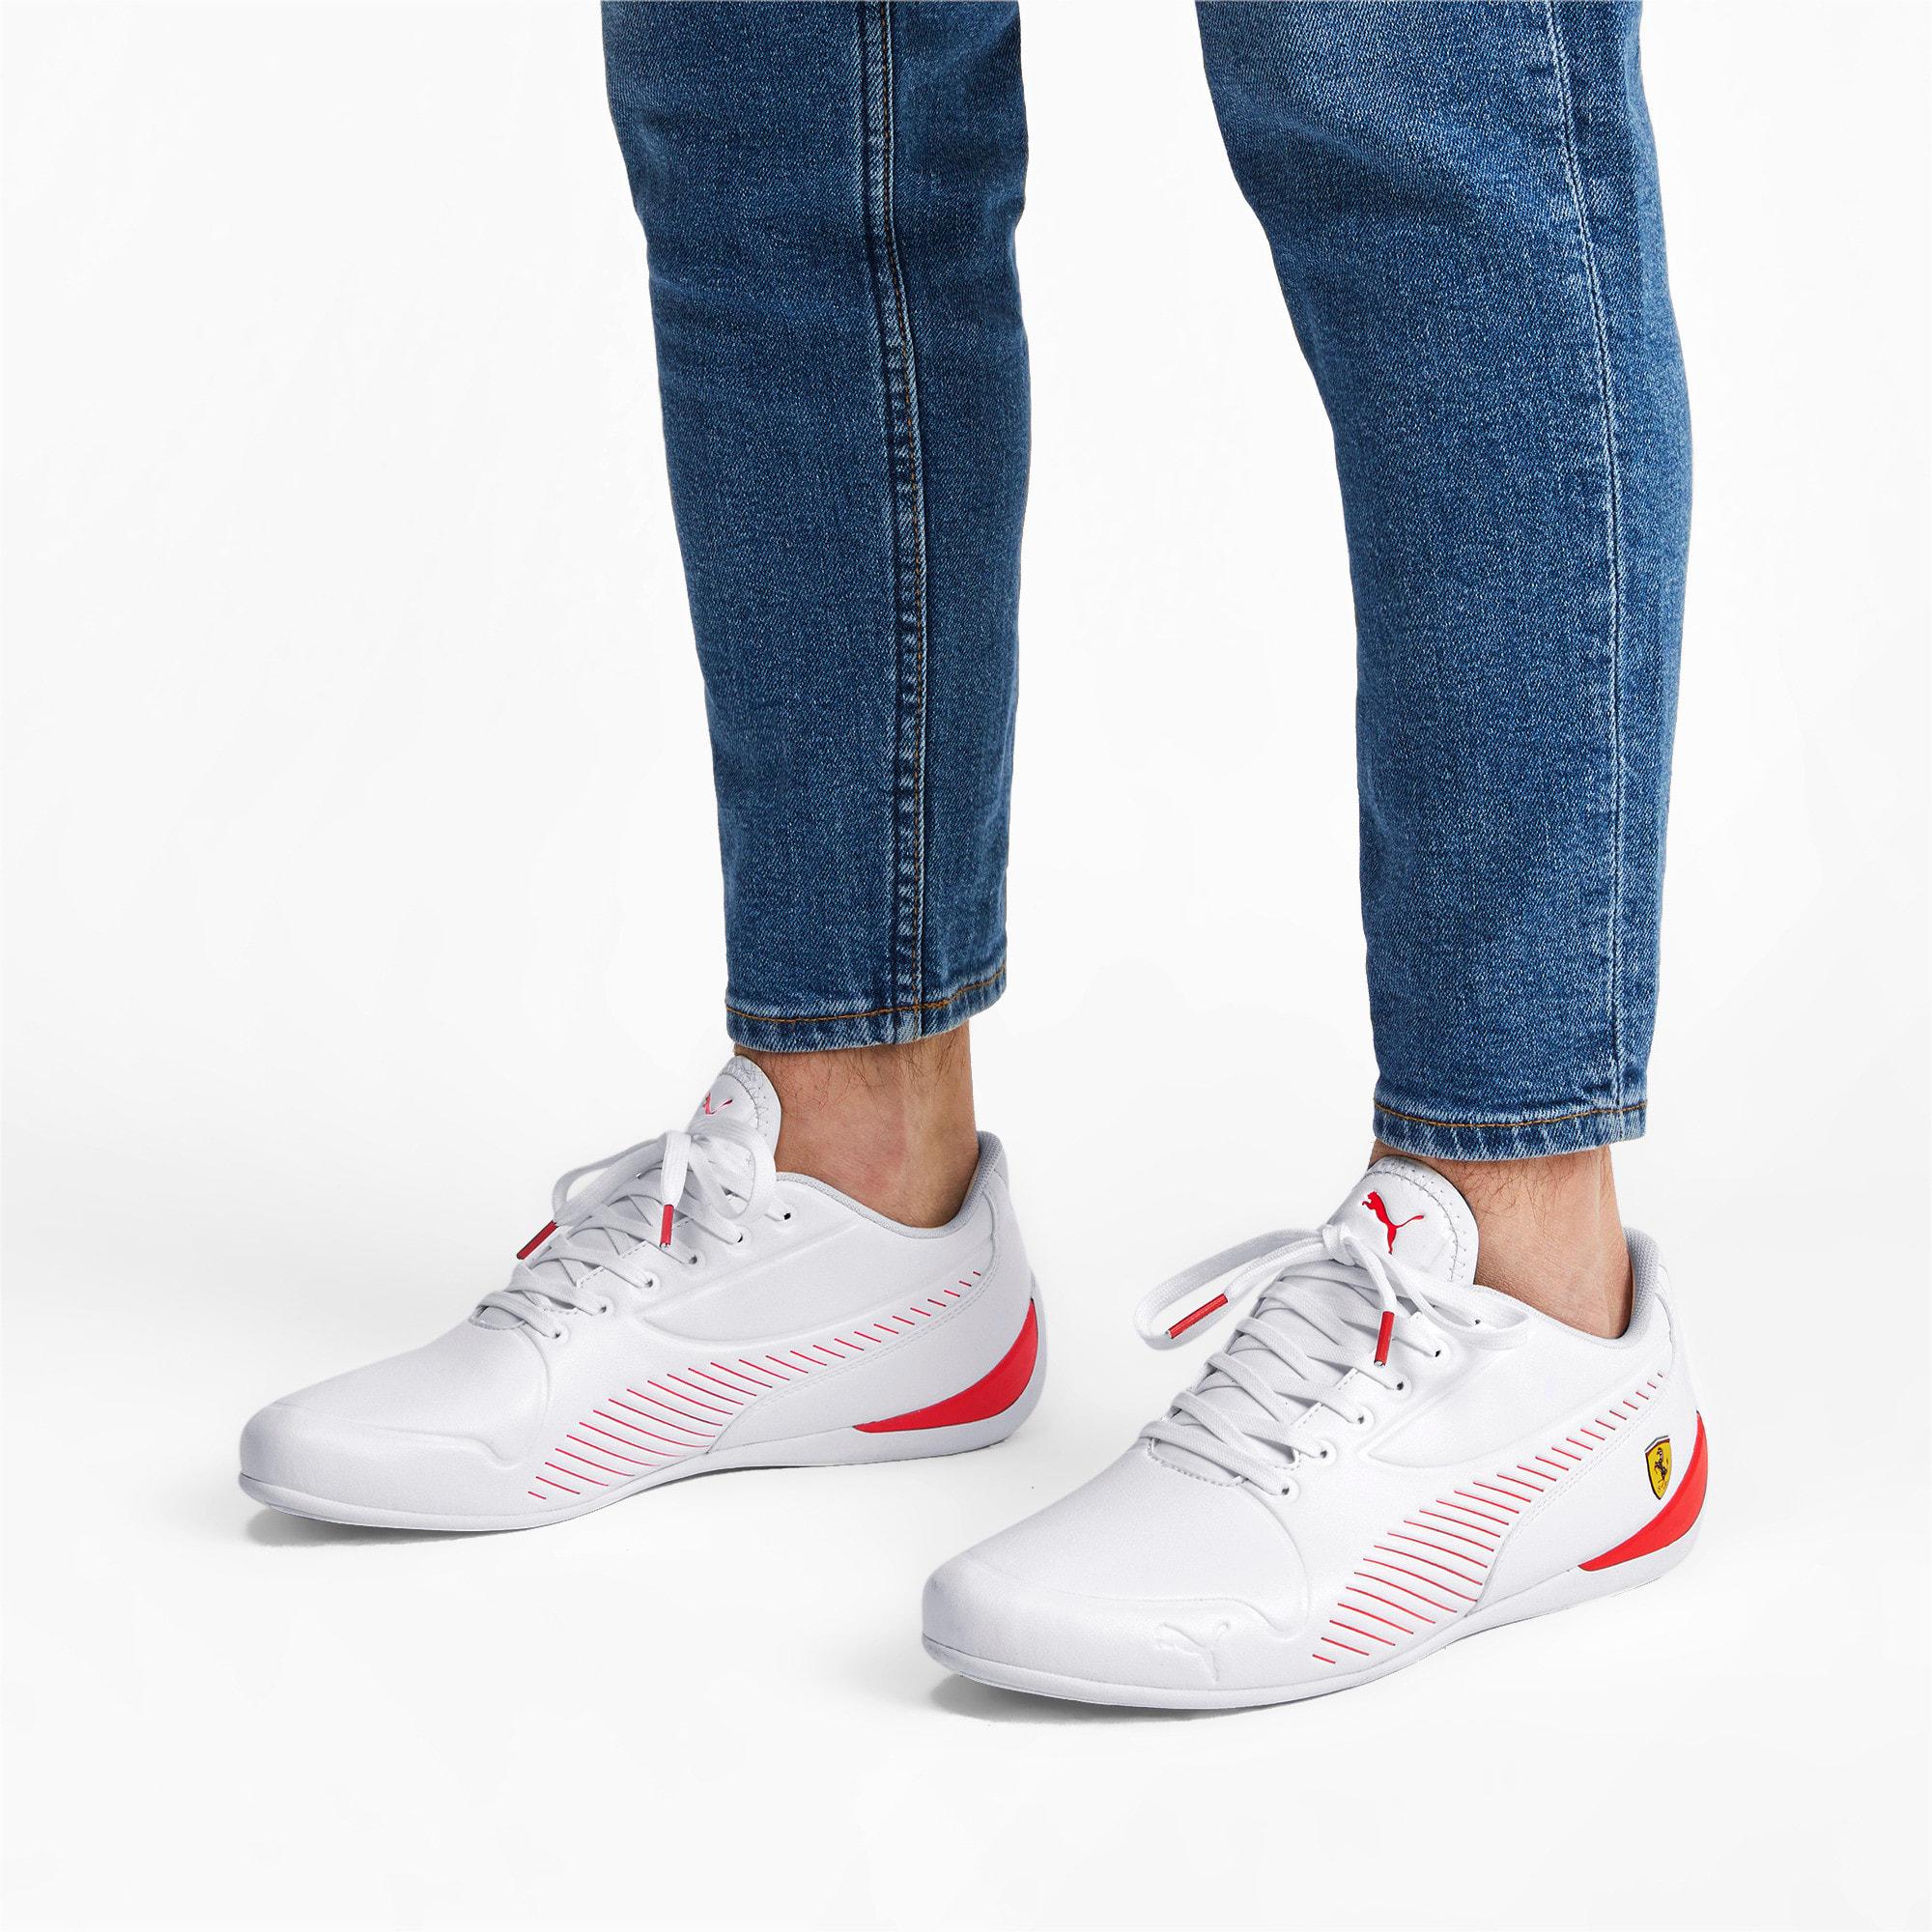 Thumbnail 3 of Scuderia Ferrari Drift Cat 7S Ultra Men's Shoes, Puma White-Rosso Corsa, medium